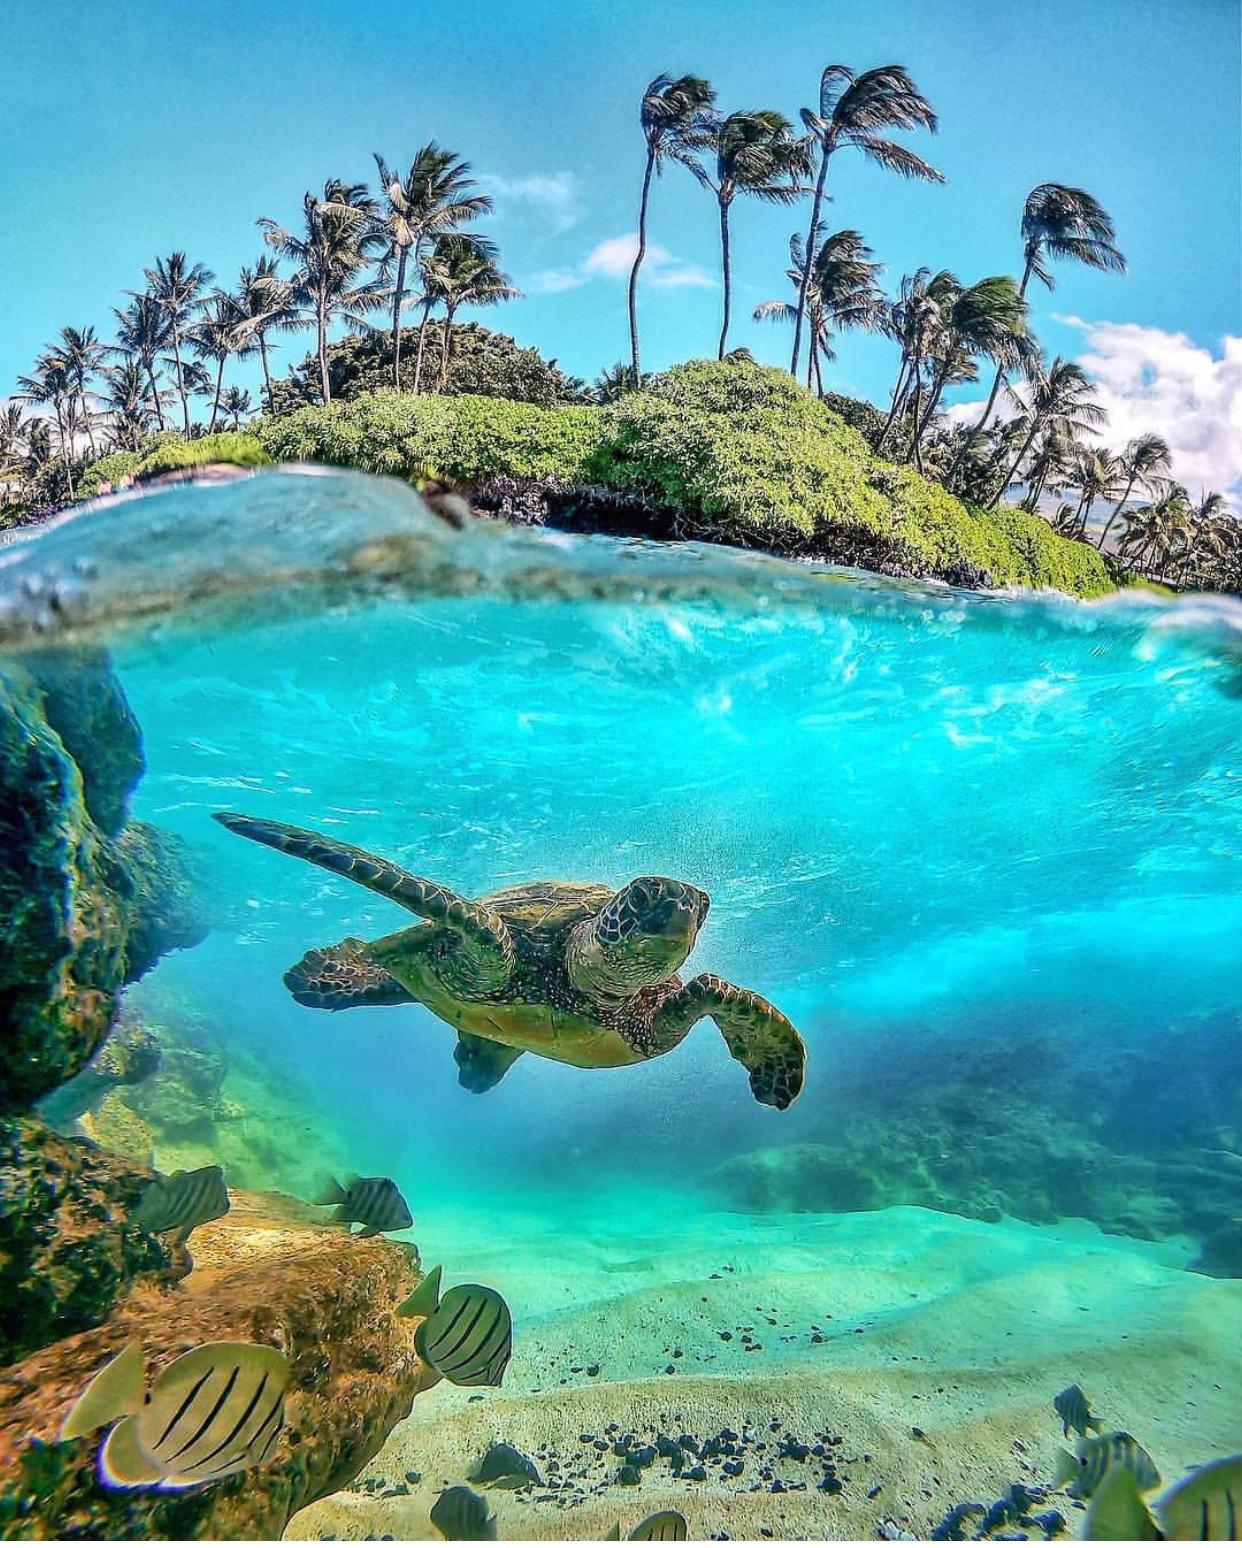 Hawaii, USA by Jiayi Hax